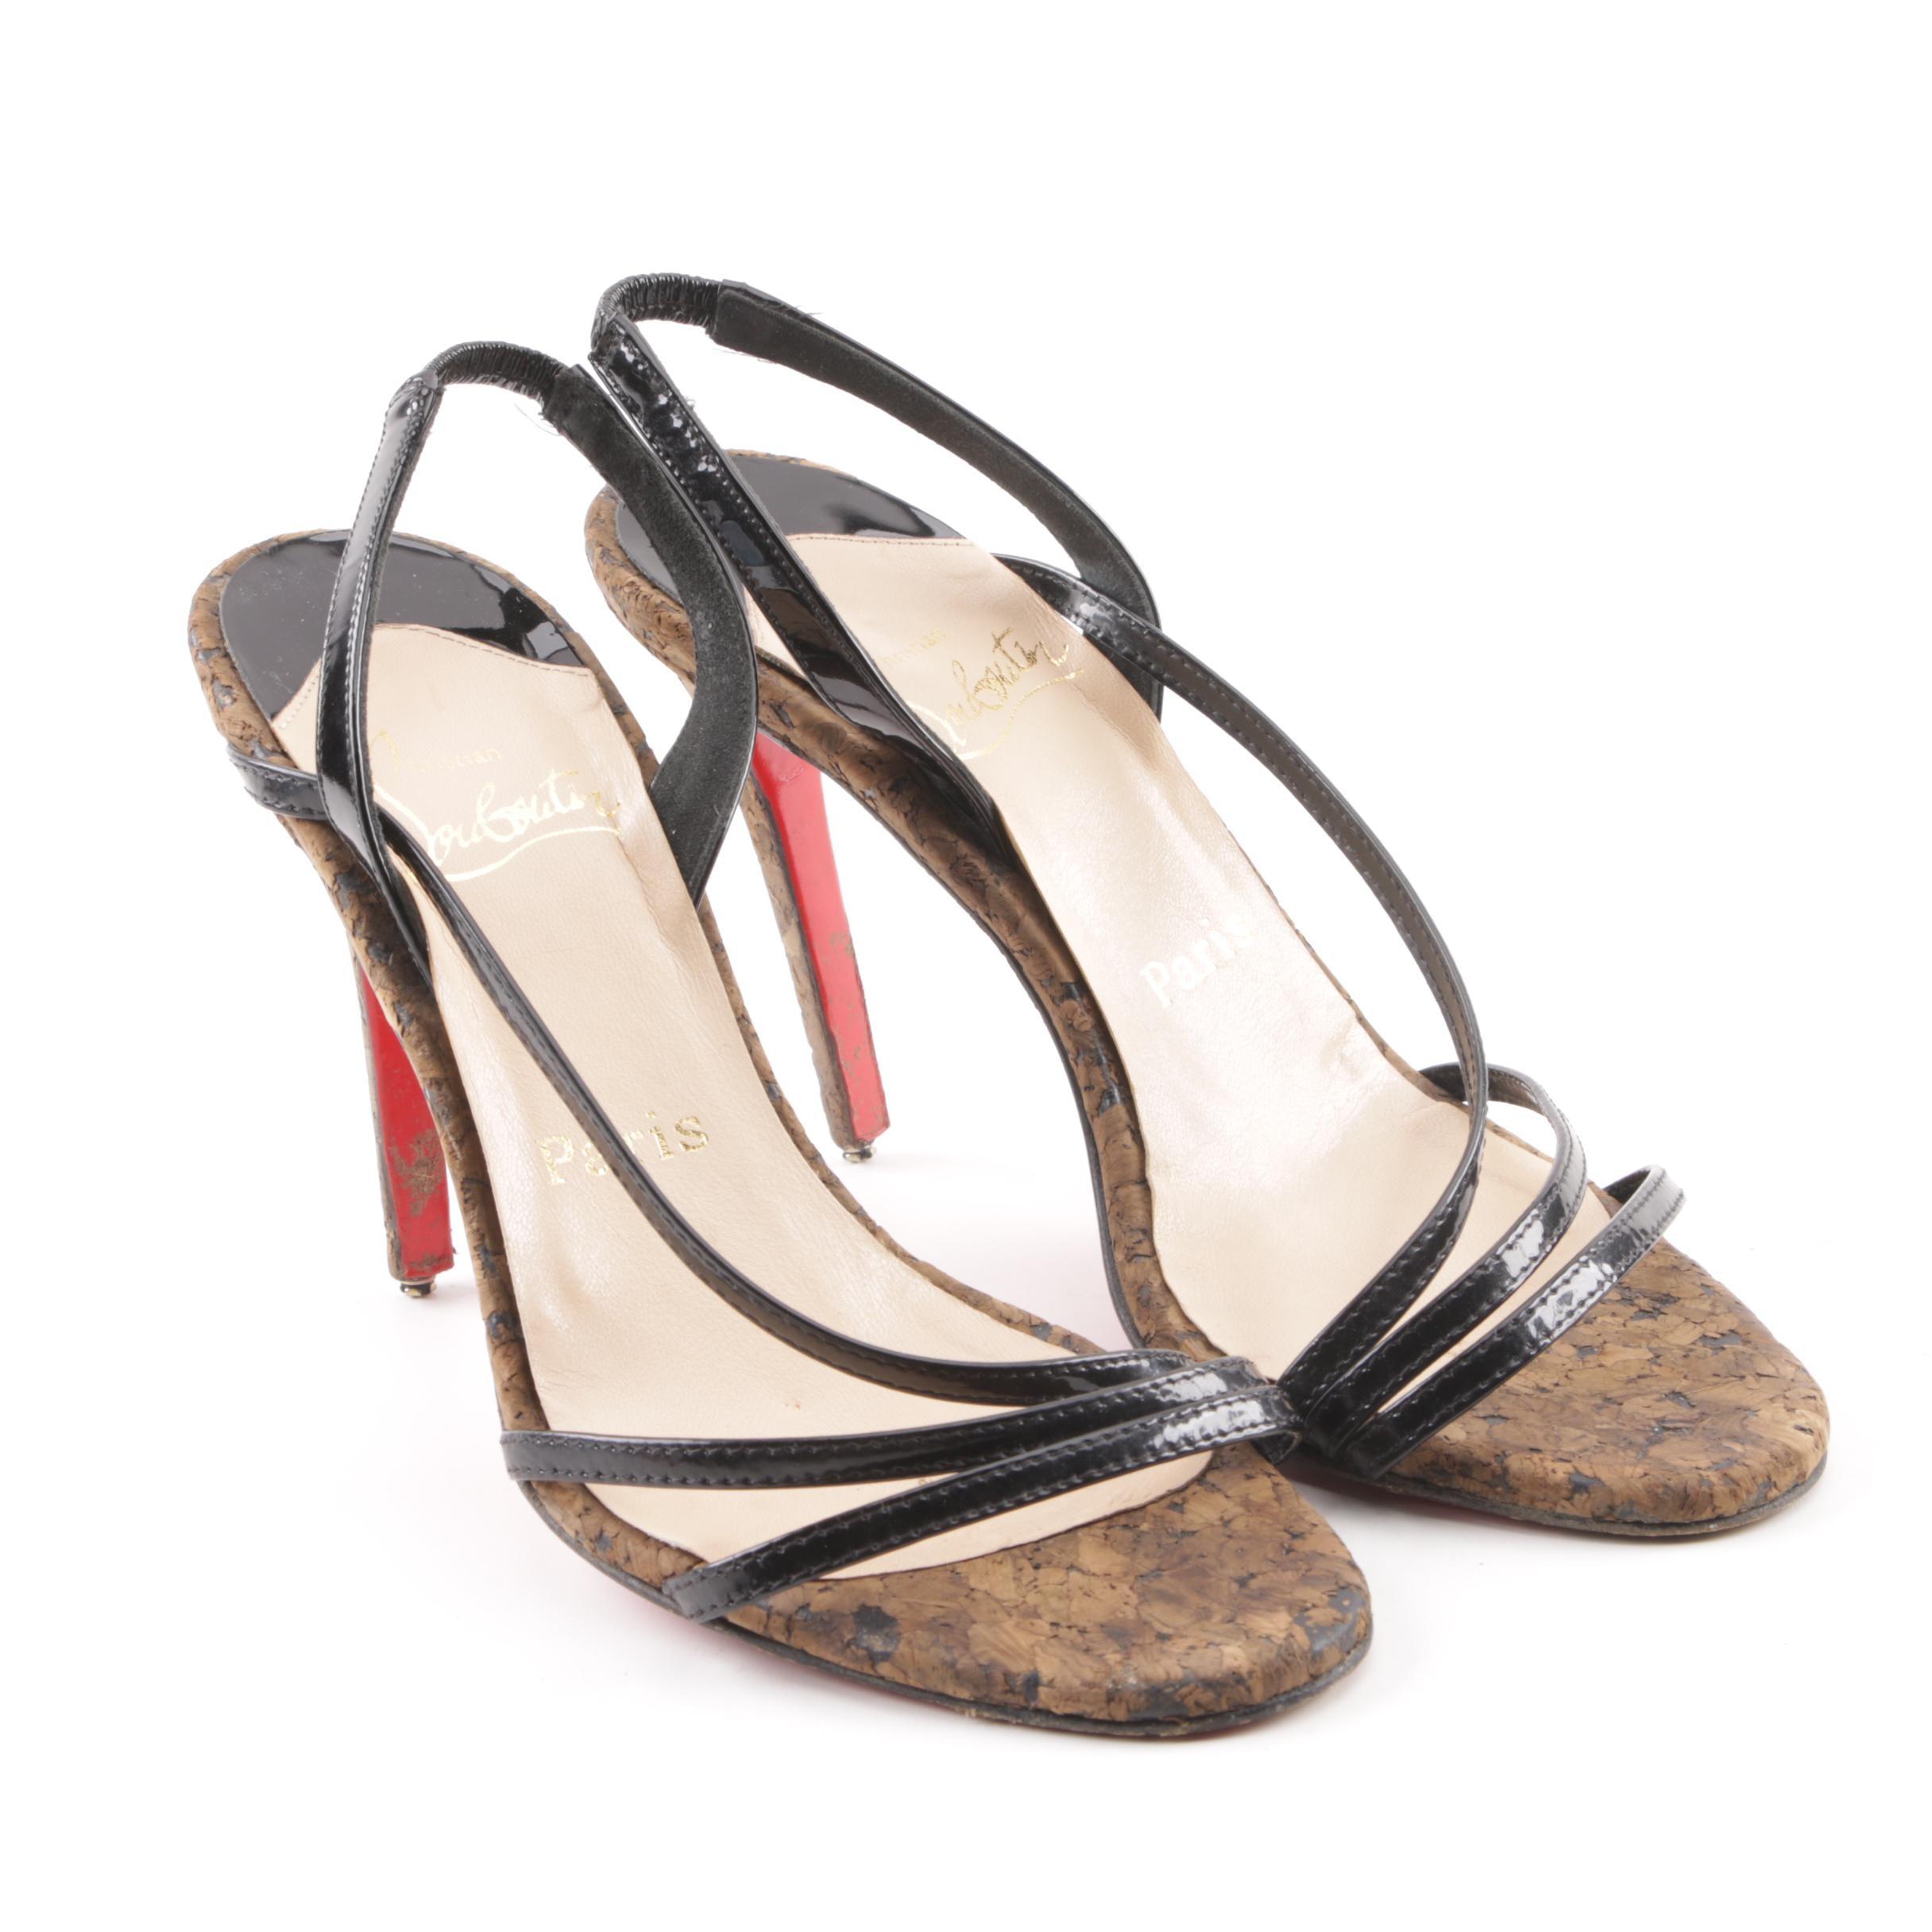 Women's Christian Louboutin Brown Patent Leather Cork Heel Slingback Sandals